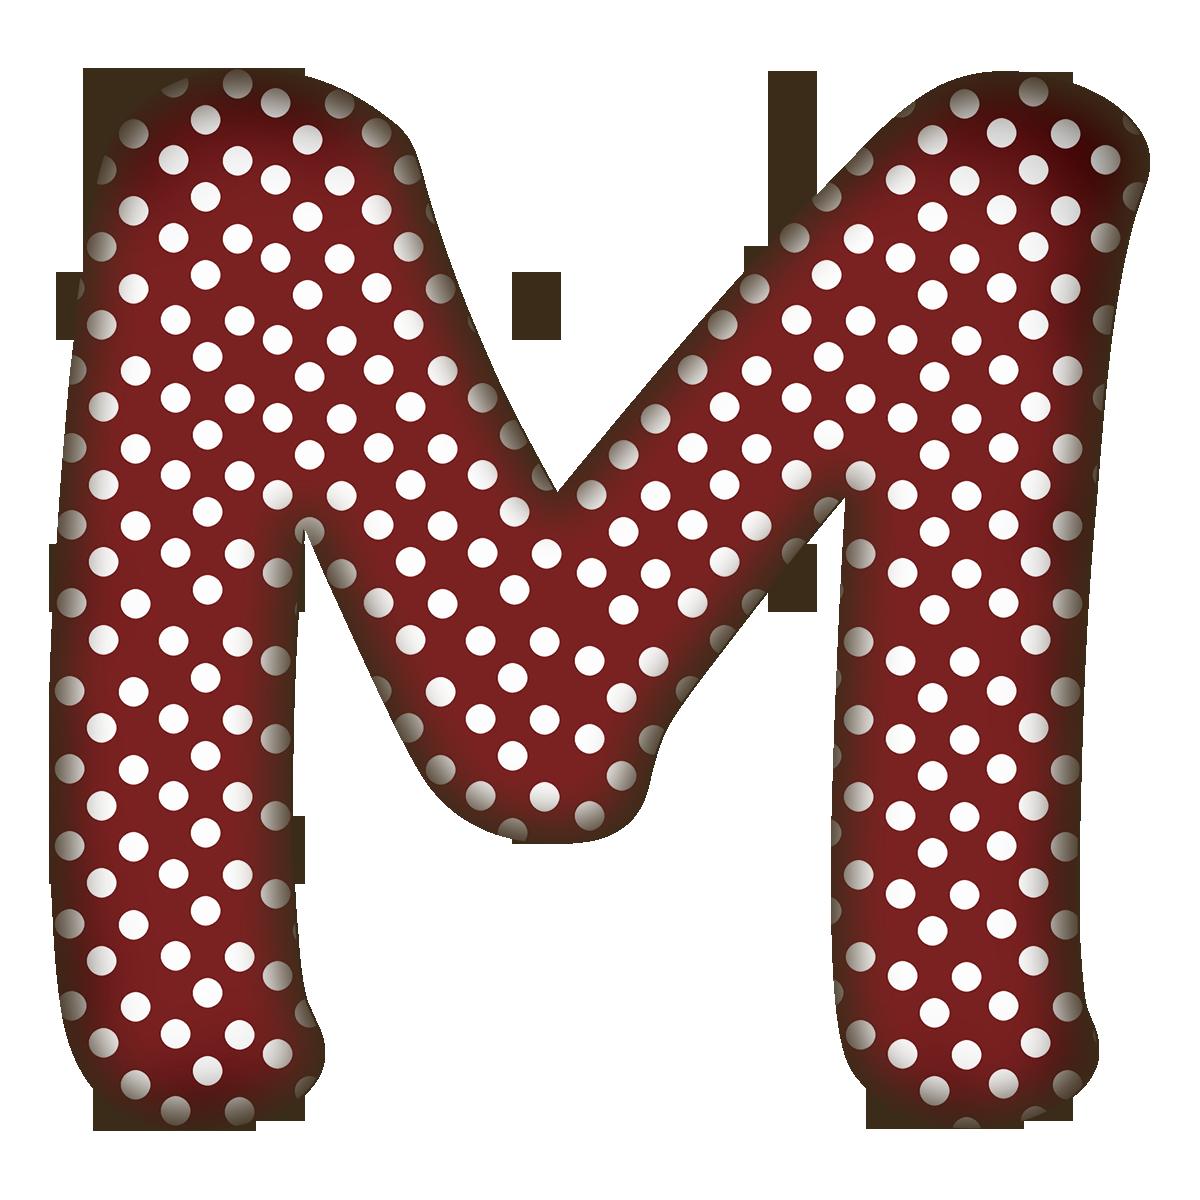 M Dr Odd Letter Work M Pinterest Search - M